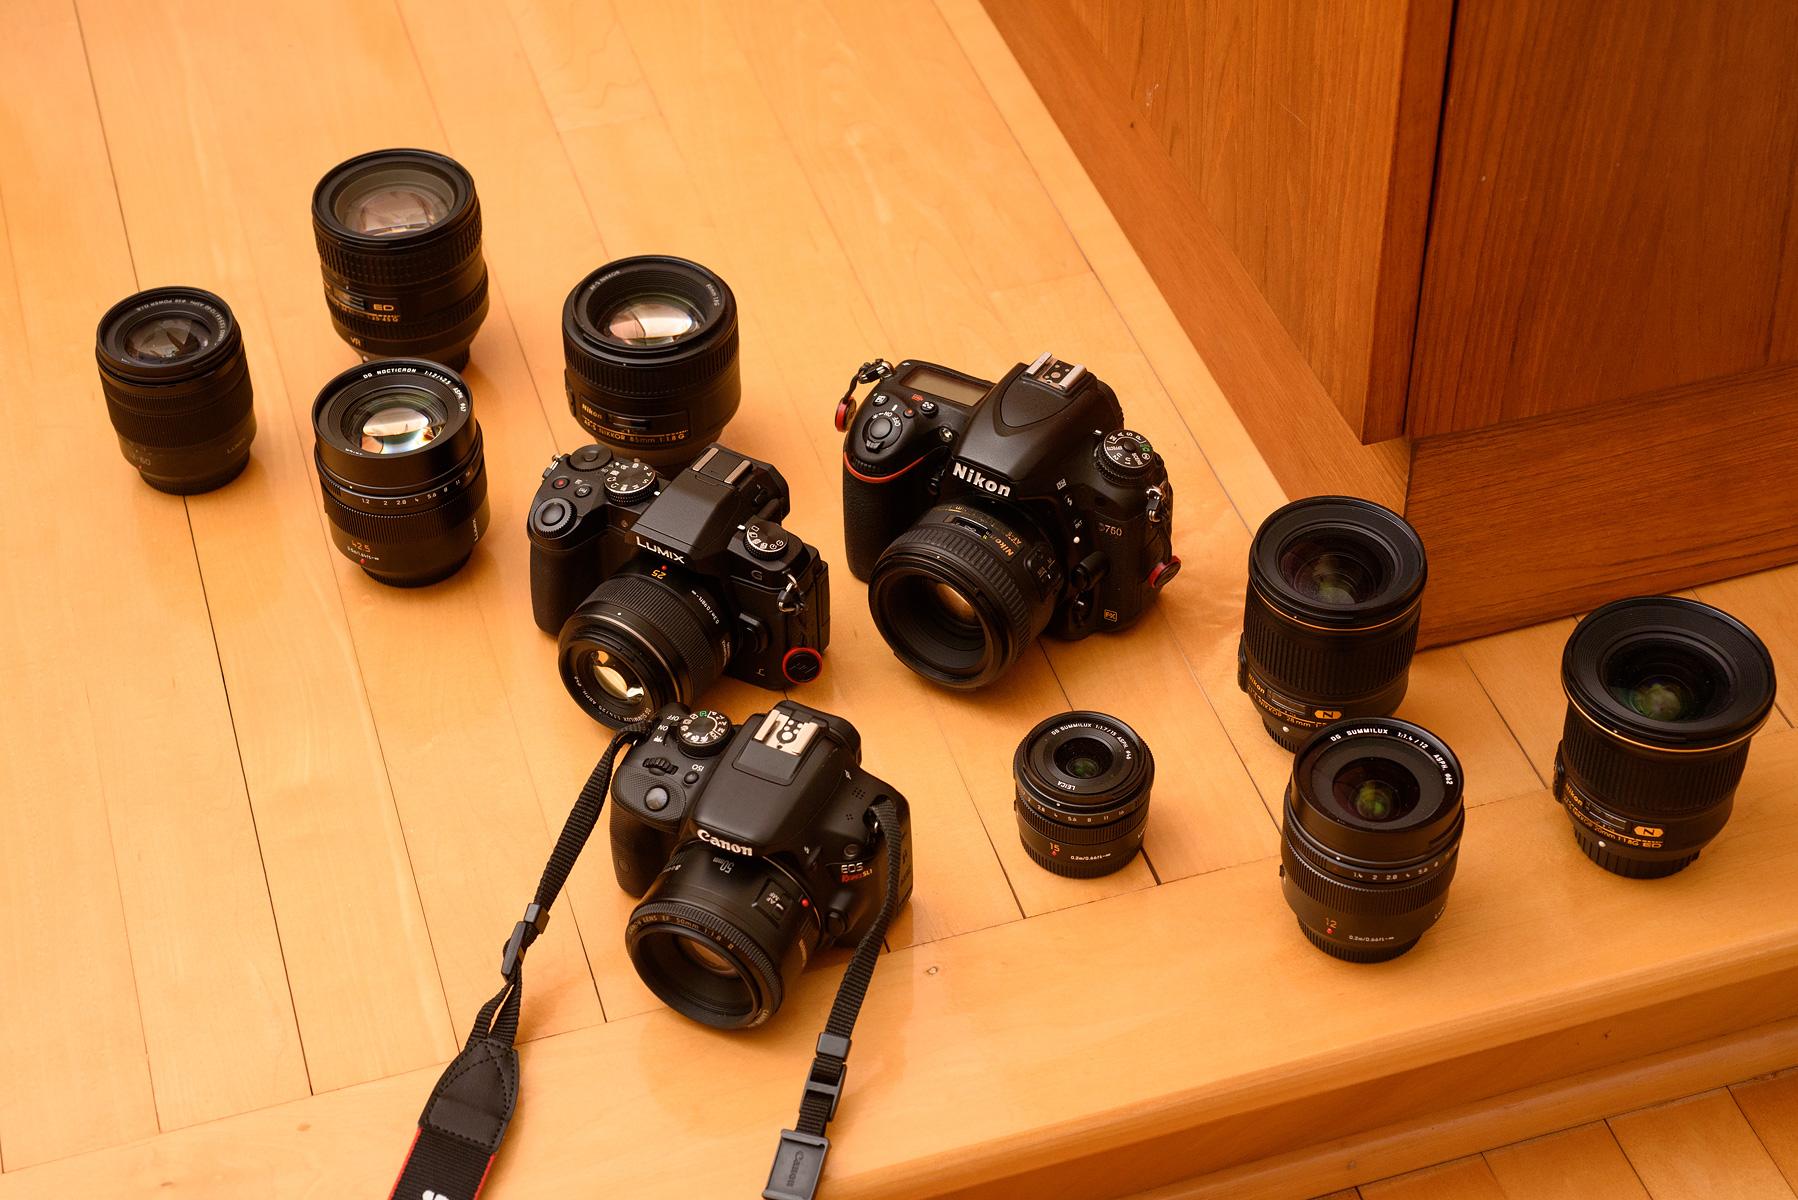 The cumbersome Rebel SL1, the g85, my fullframe Nikon. Dat badass Leica 42.5mm f/1.2 nocticron